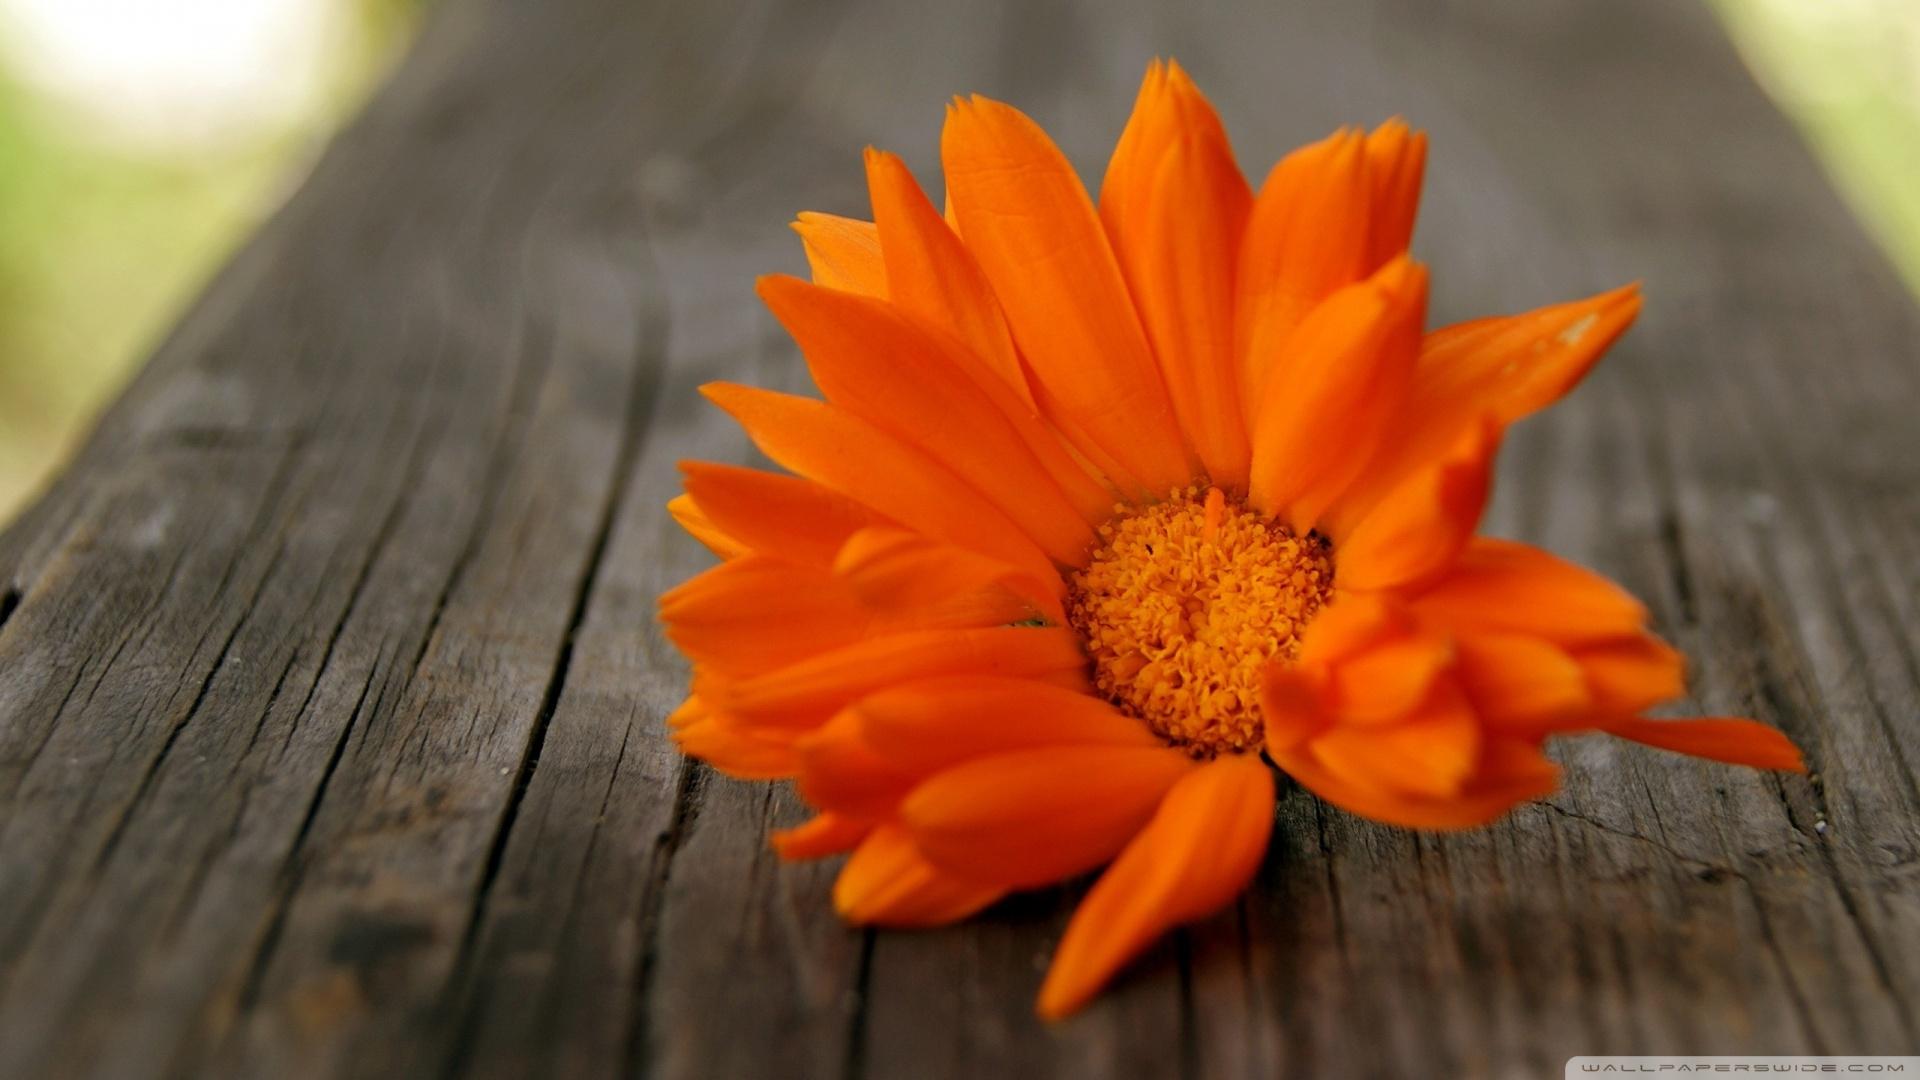 Beautiful Orange Flower Wallpaper 1920x1080 Beautiful Orange Flower 1920x1080